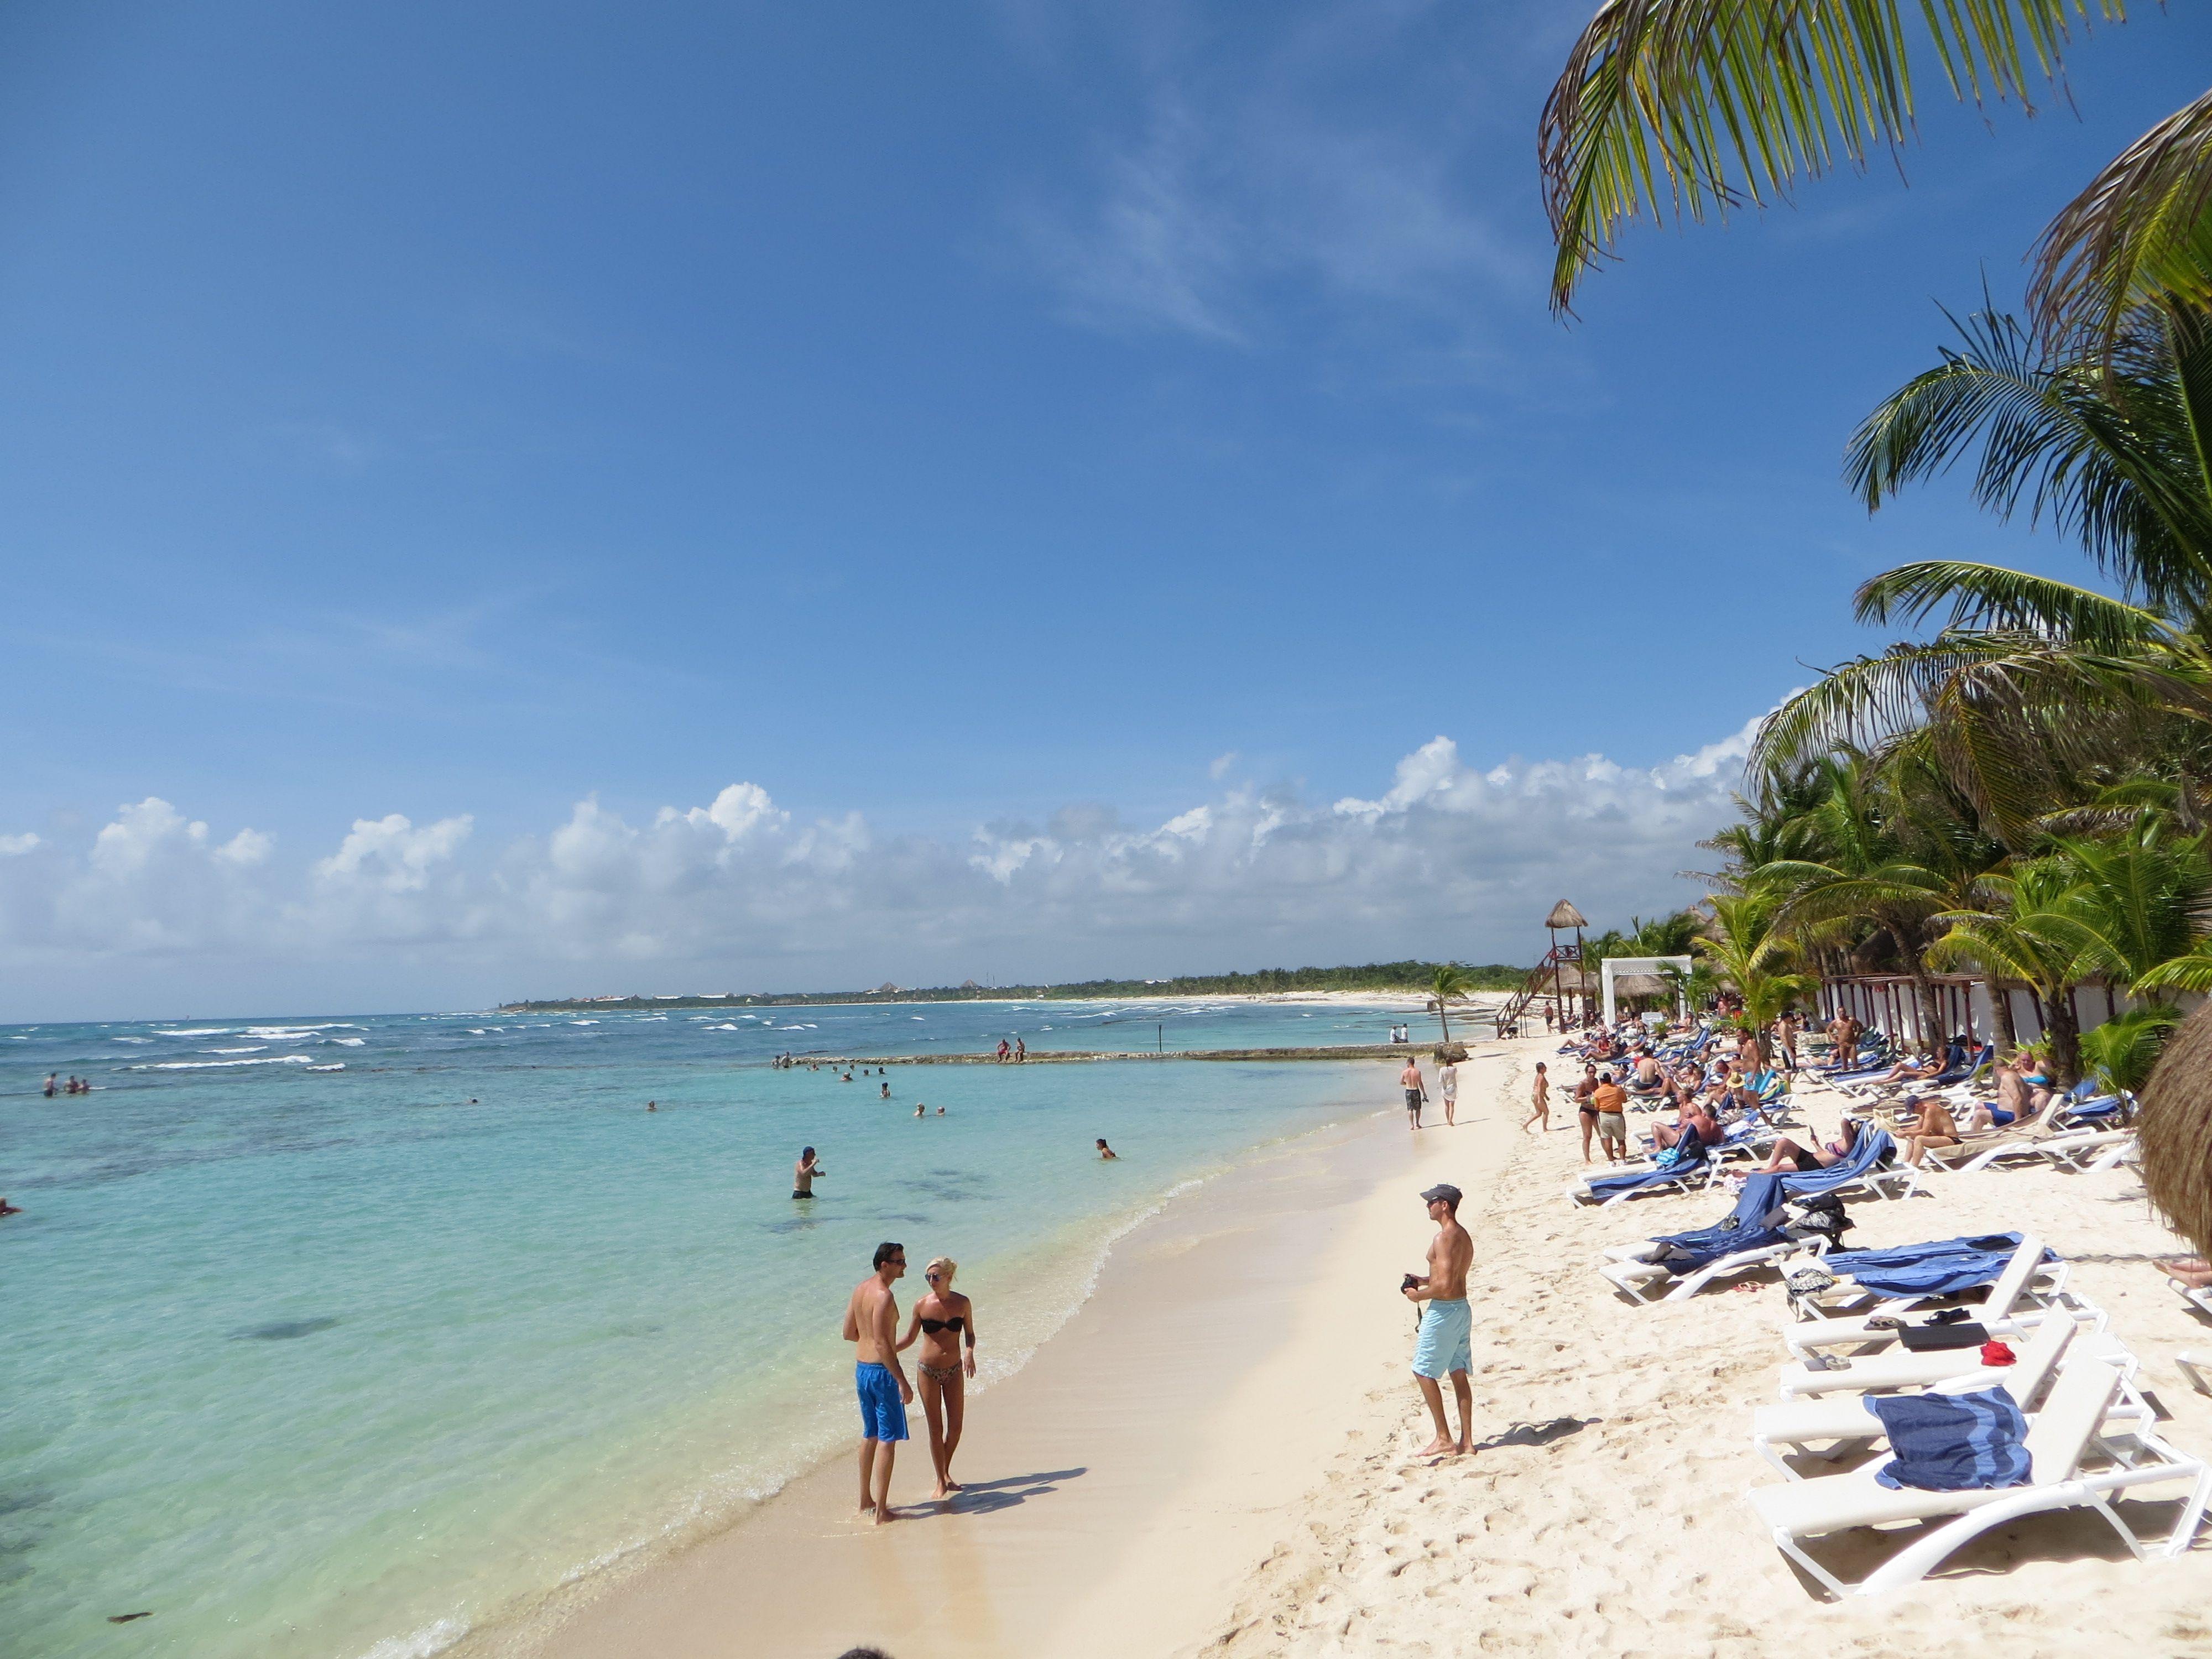 El Dorado Seaside Suites #beach view #sunnyday #karismaexperience ...